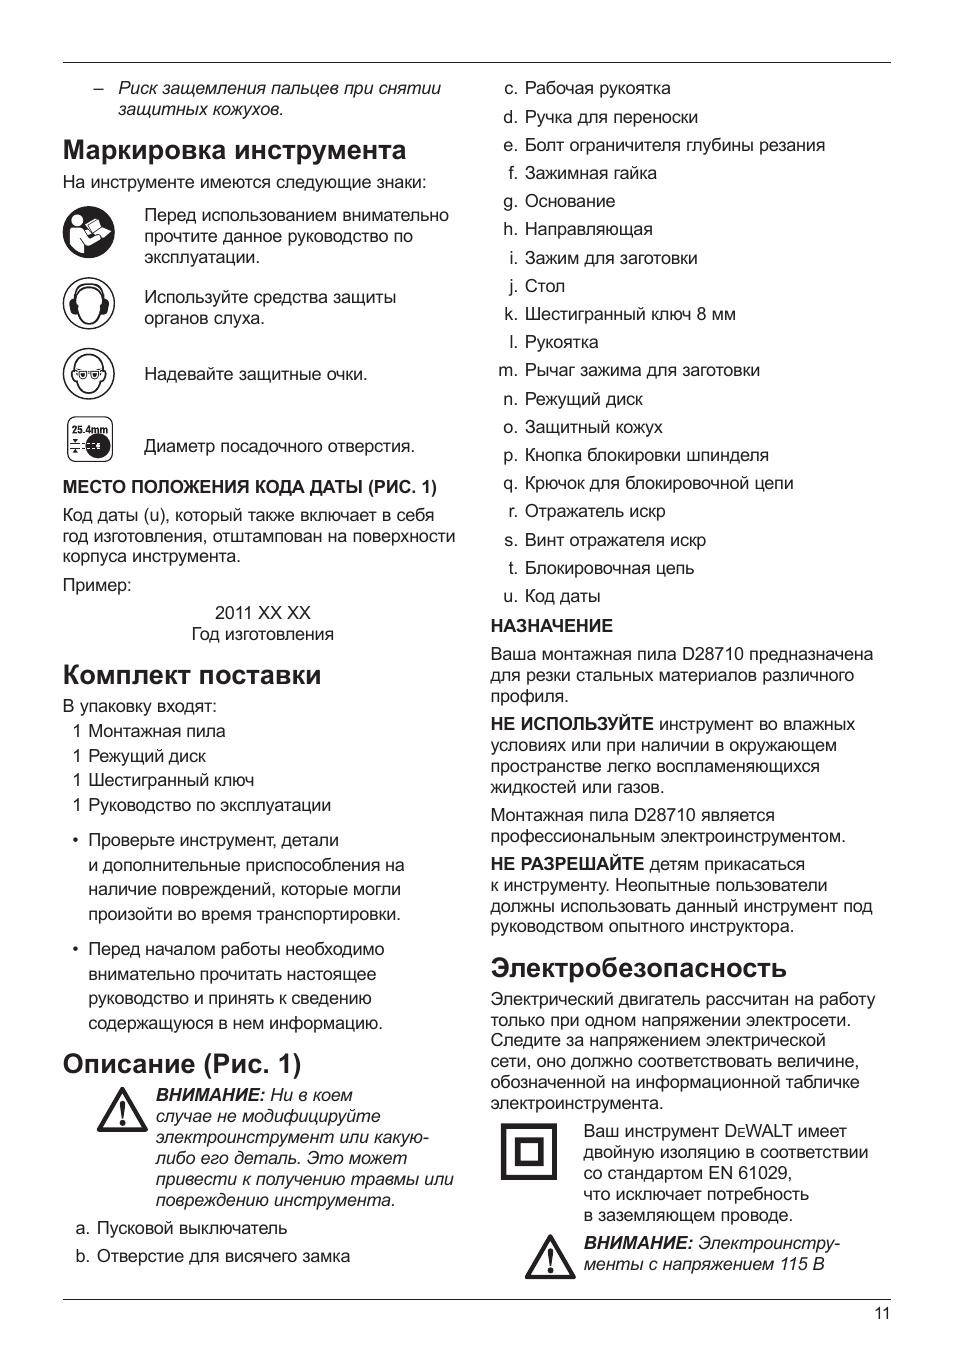 Маркировка инструмента по электробезопасности протокол электробезопасности